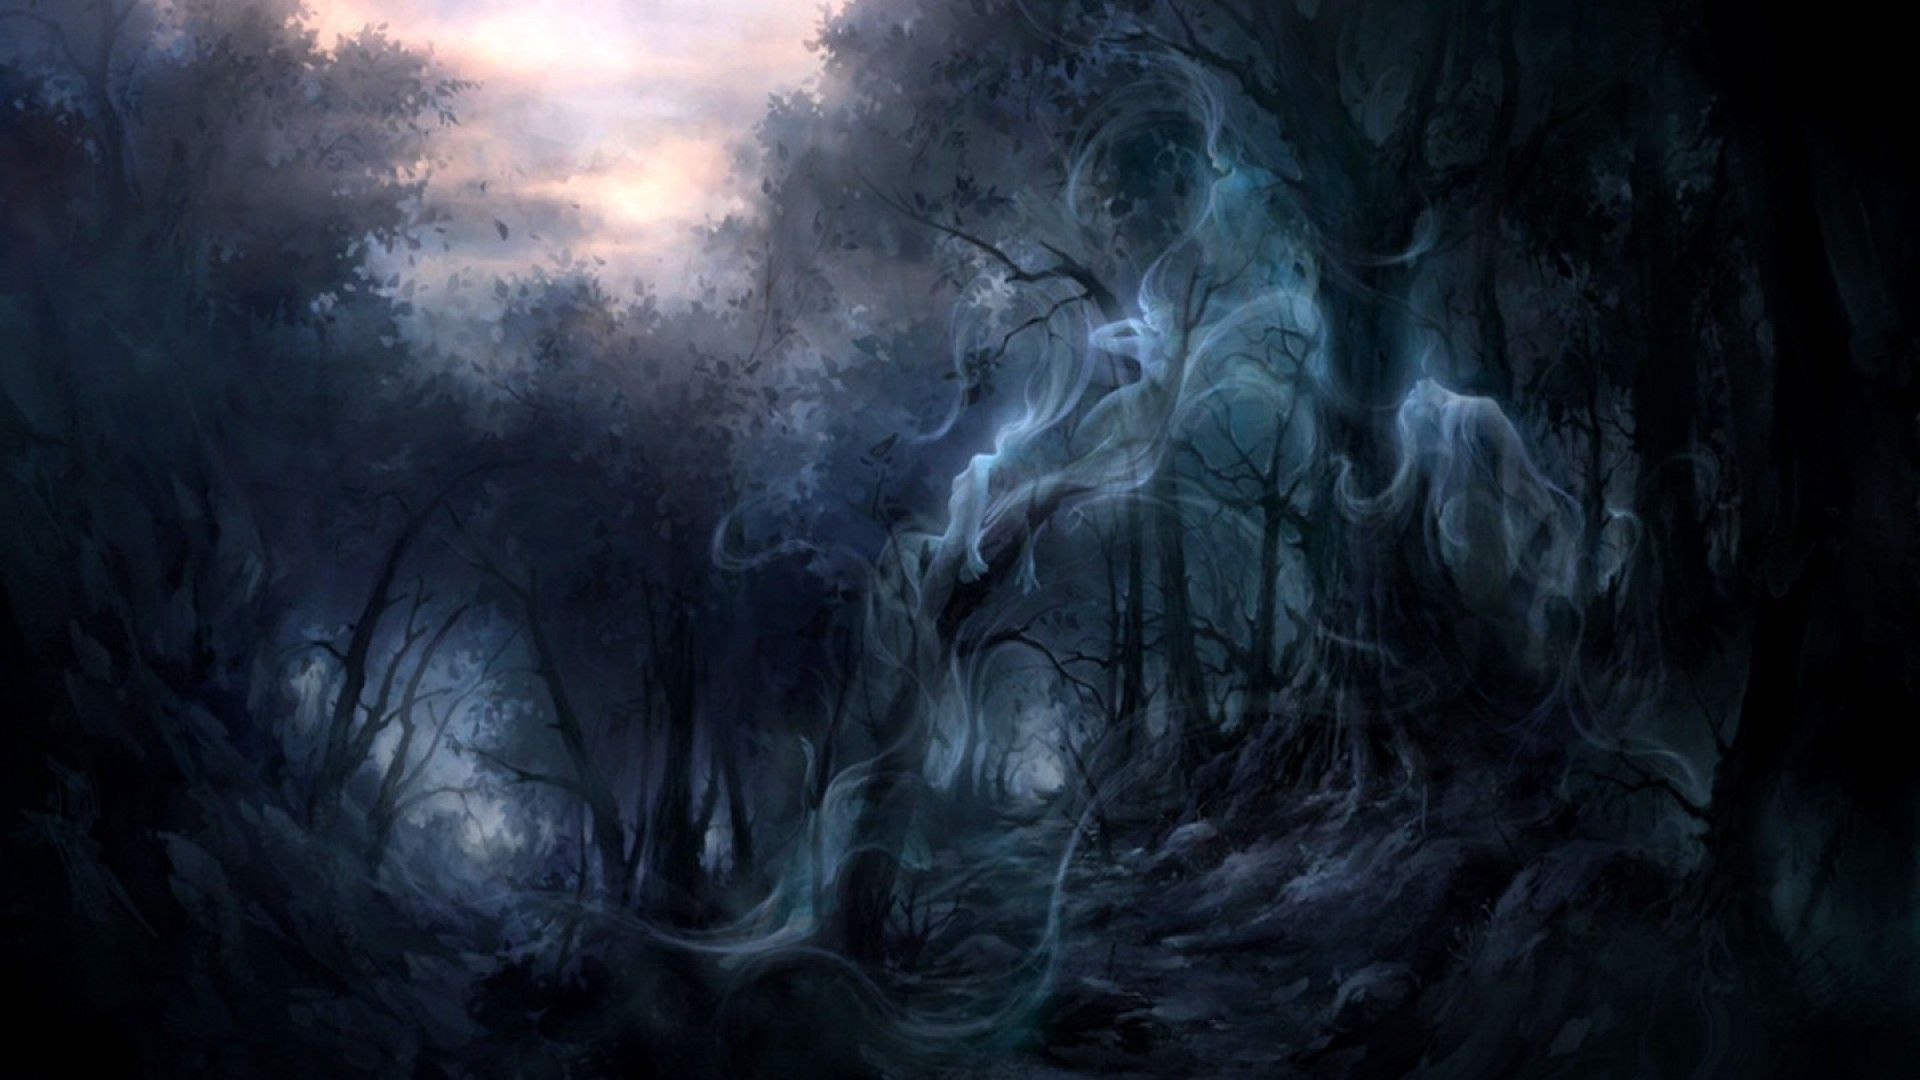 dark enchanted forest | Forests | Pinterest | Bridges